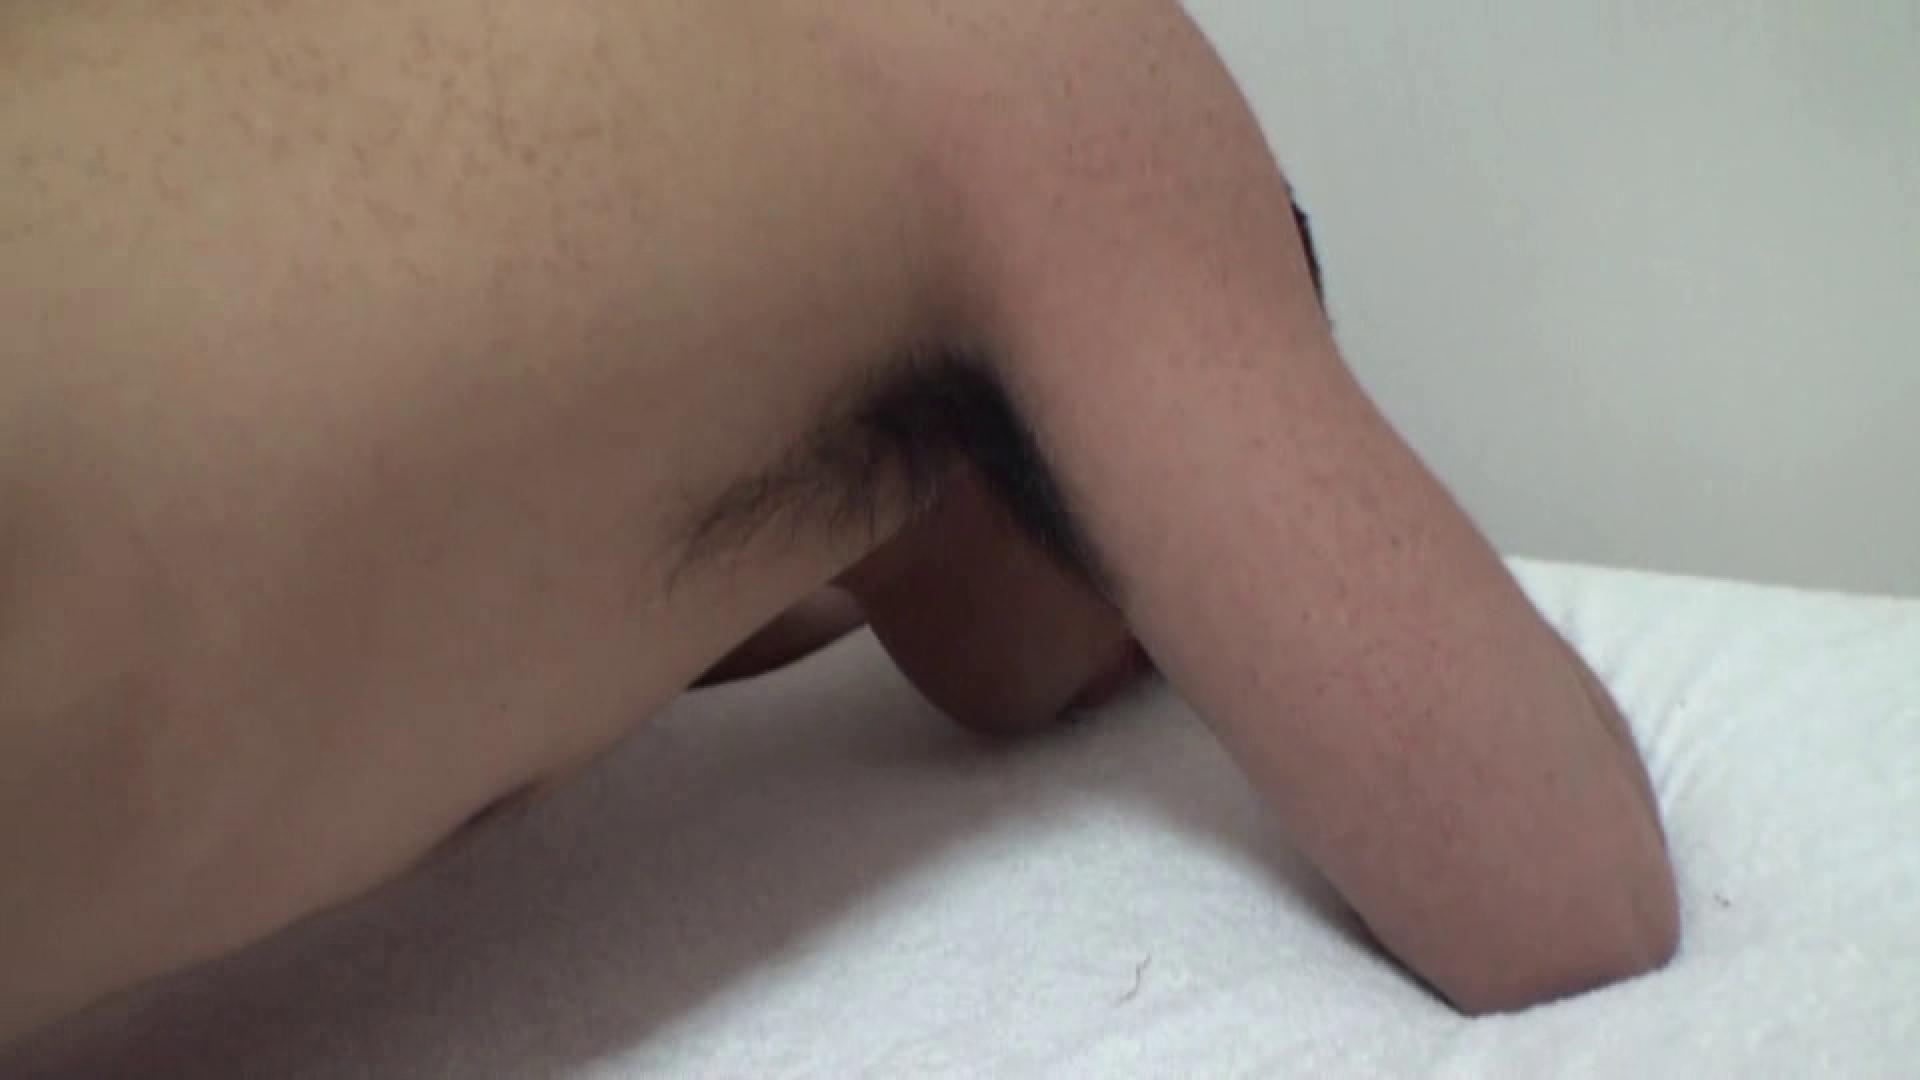 HD 良太と健二当たり前の日常 セックス編 VOL.03 セックス | 0  52pic 33